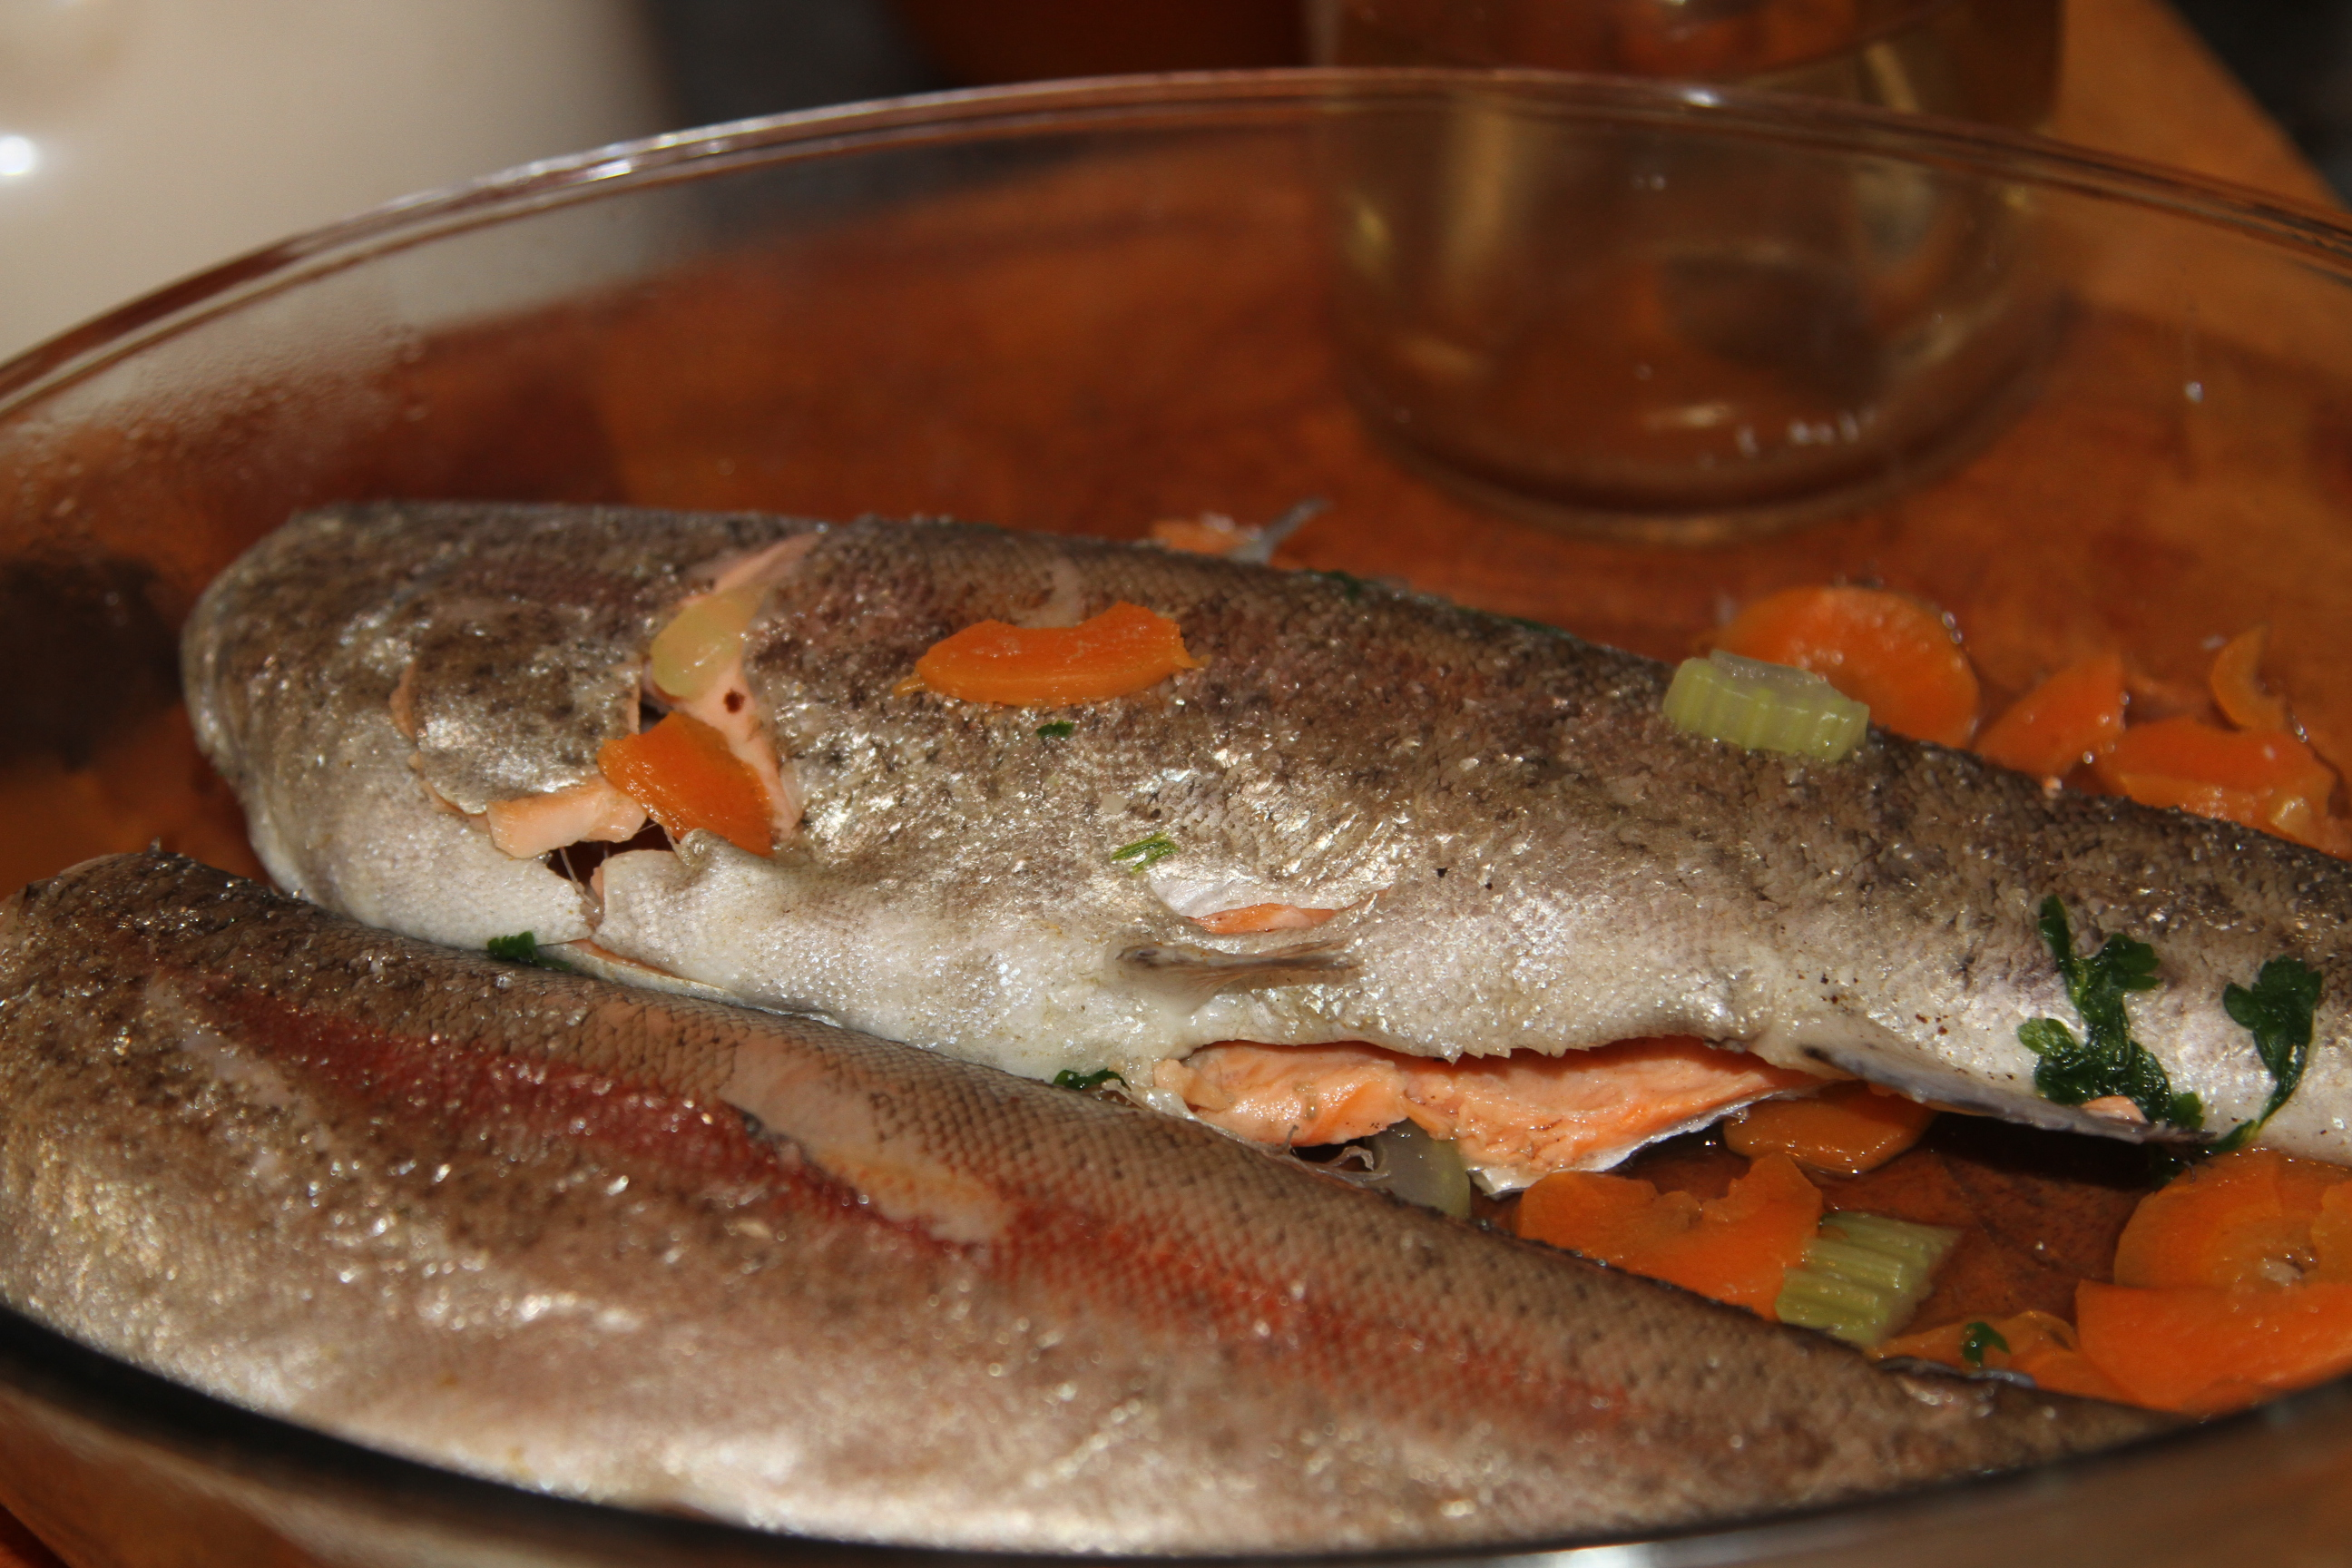 ryba gotowana